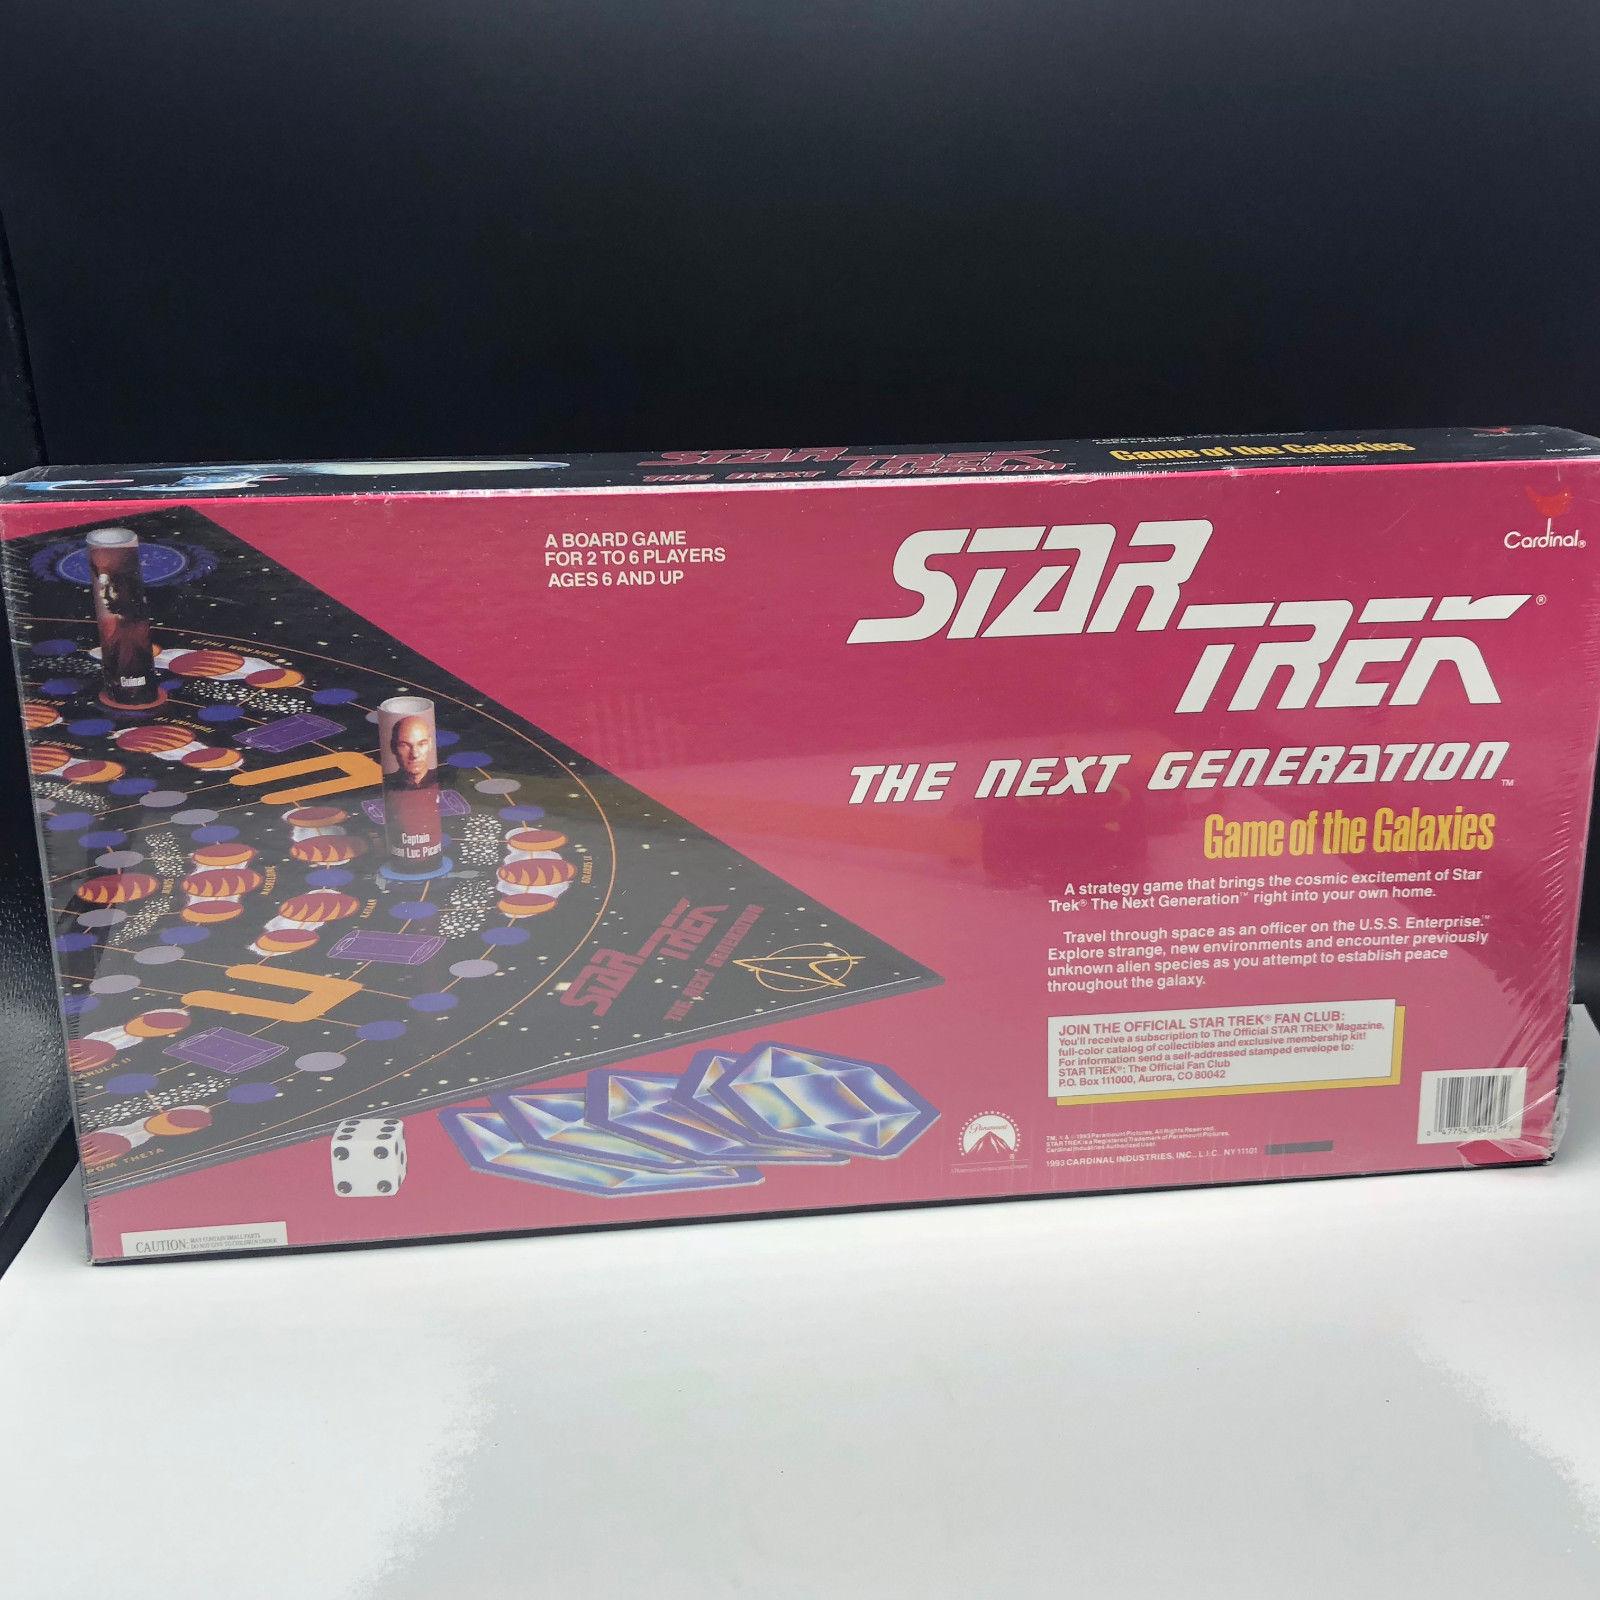 STAR TREK BOARD GAME GALAXIES new sealed vintage 1993 cardinal next generation